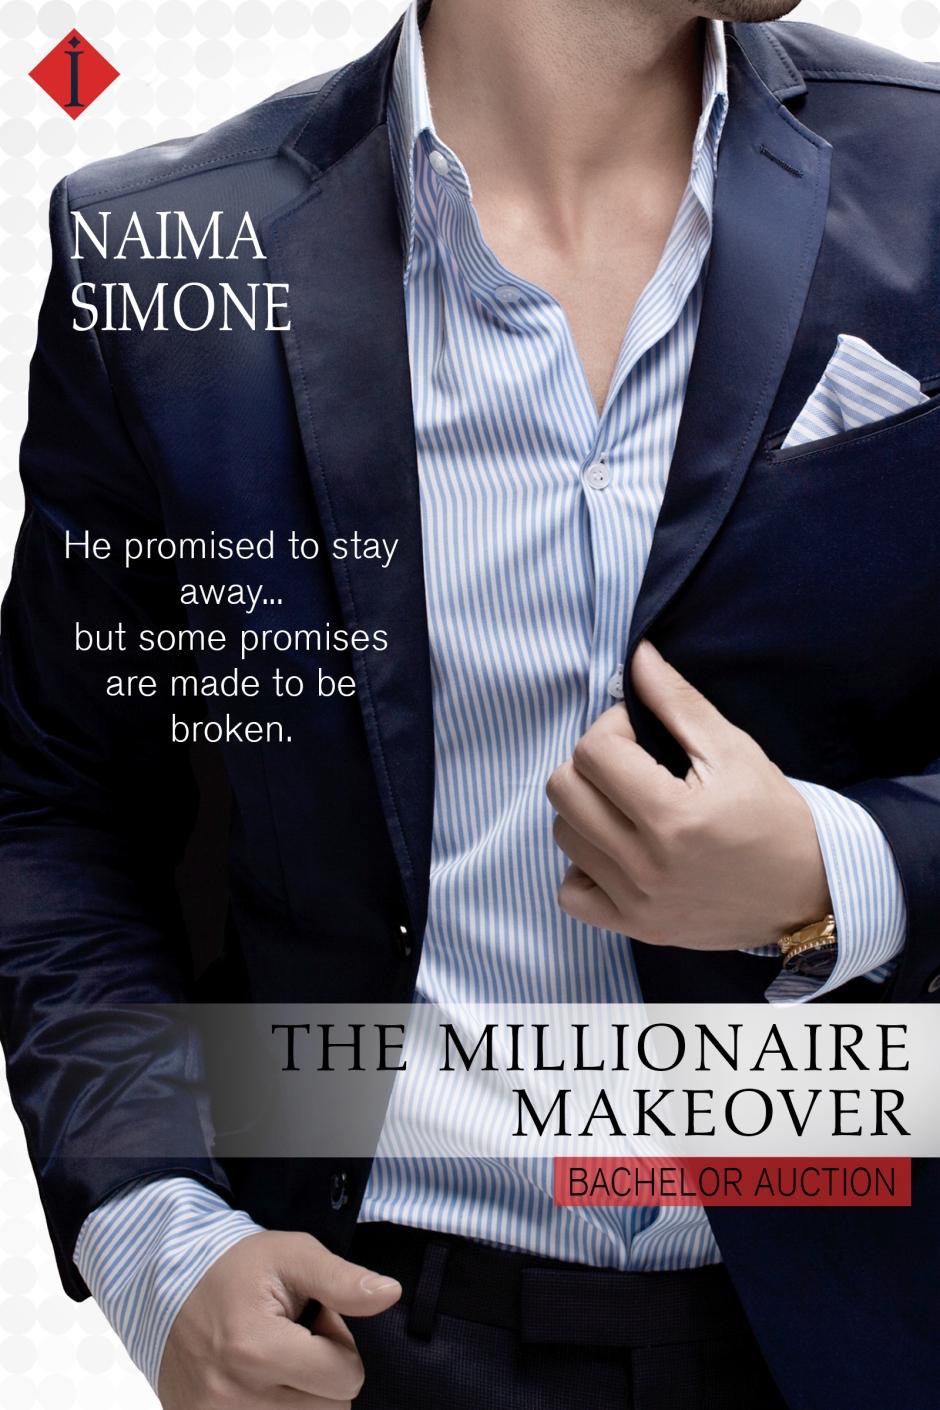 TheMillionaireMakeover